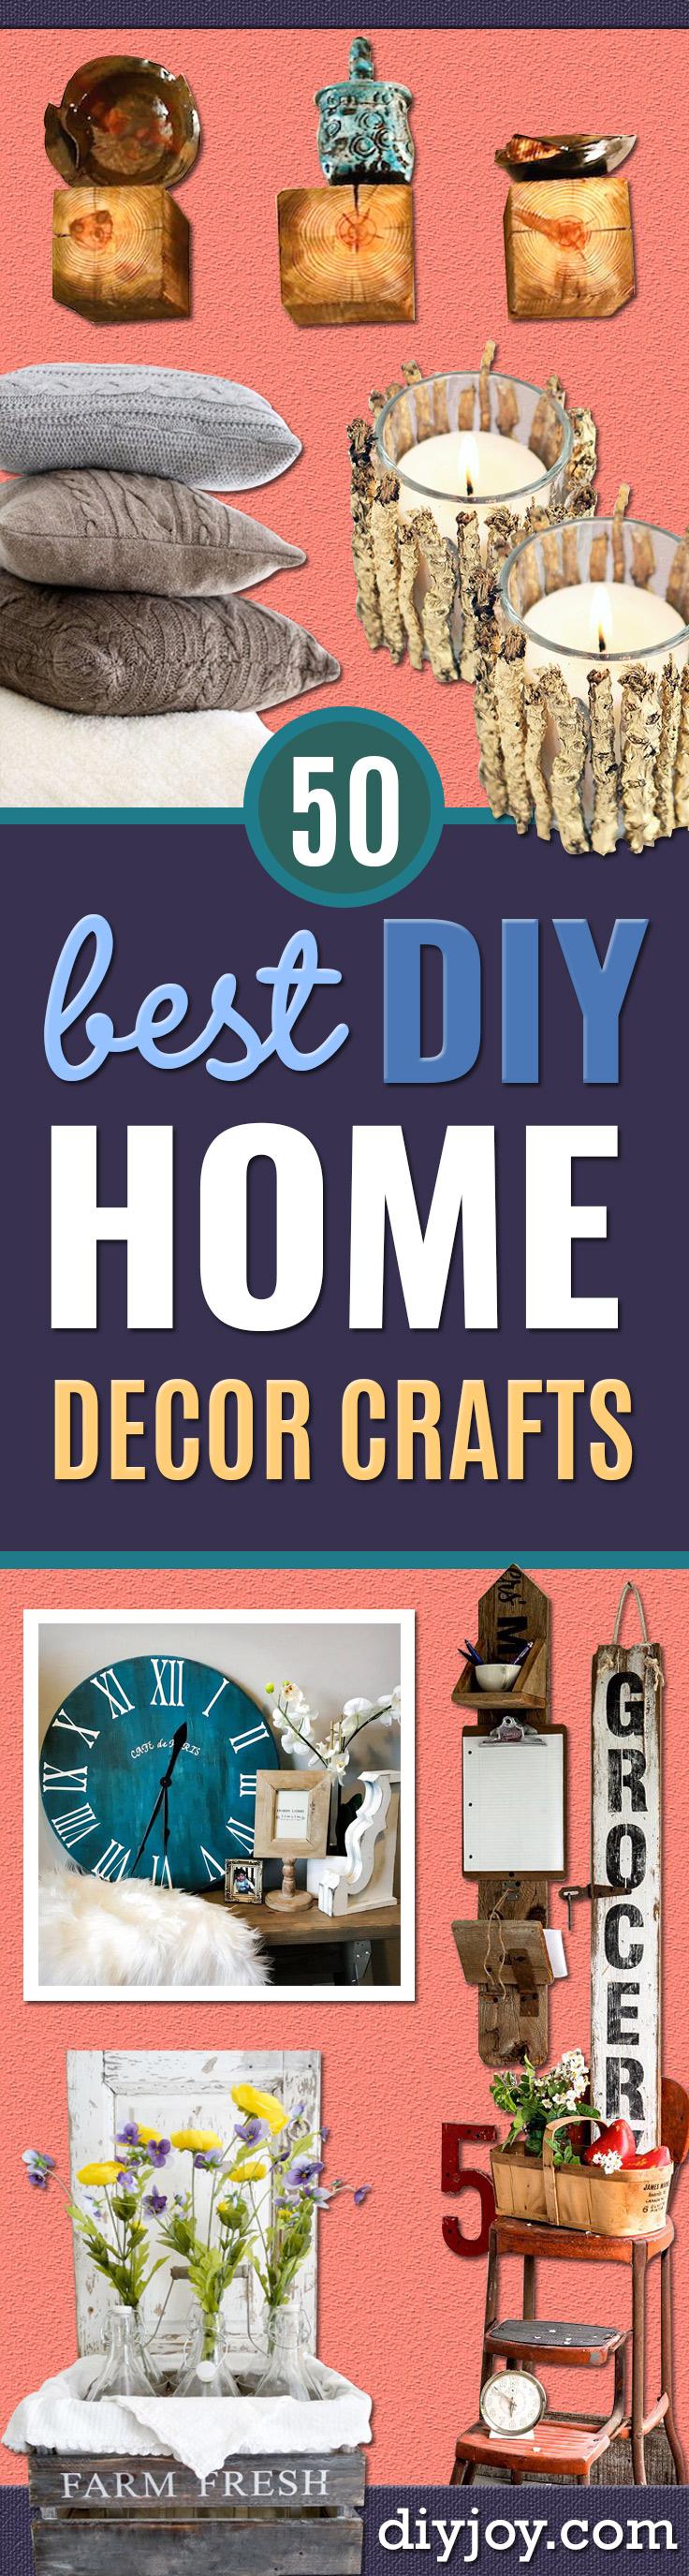 50 best diy home decor crafts ever created best diy home decor crafts easy craft ideas to make from dollar store items solutioingenieria Choice Image